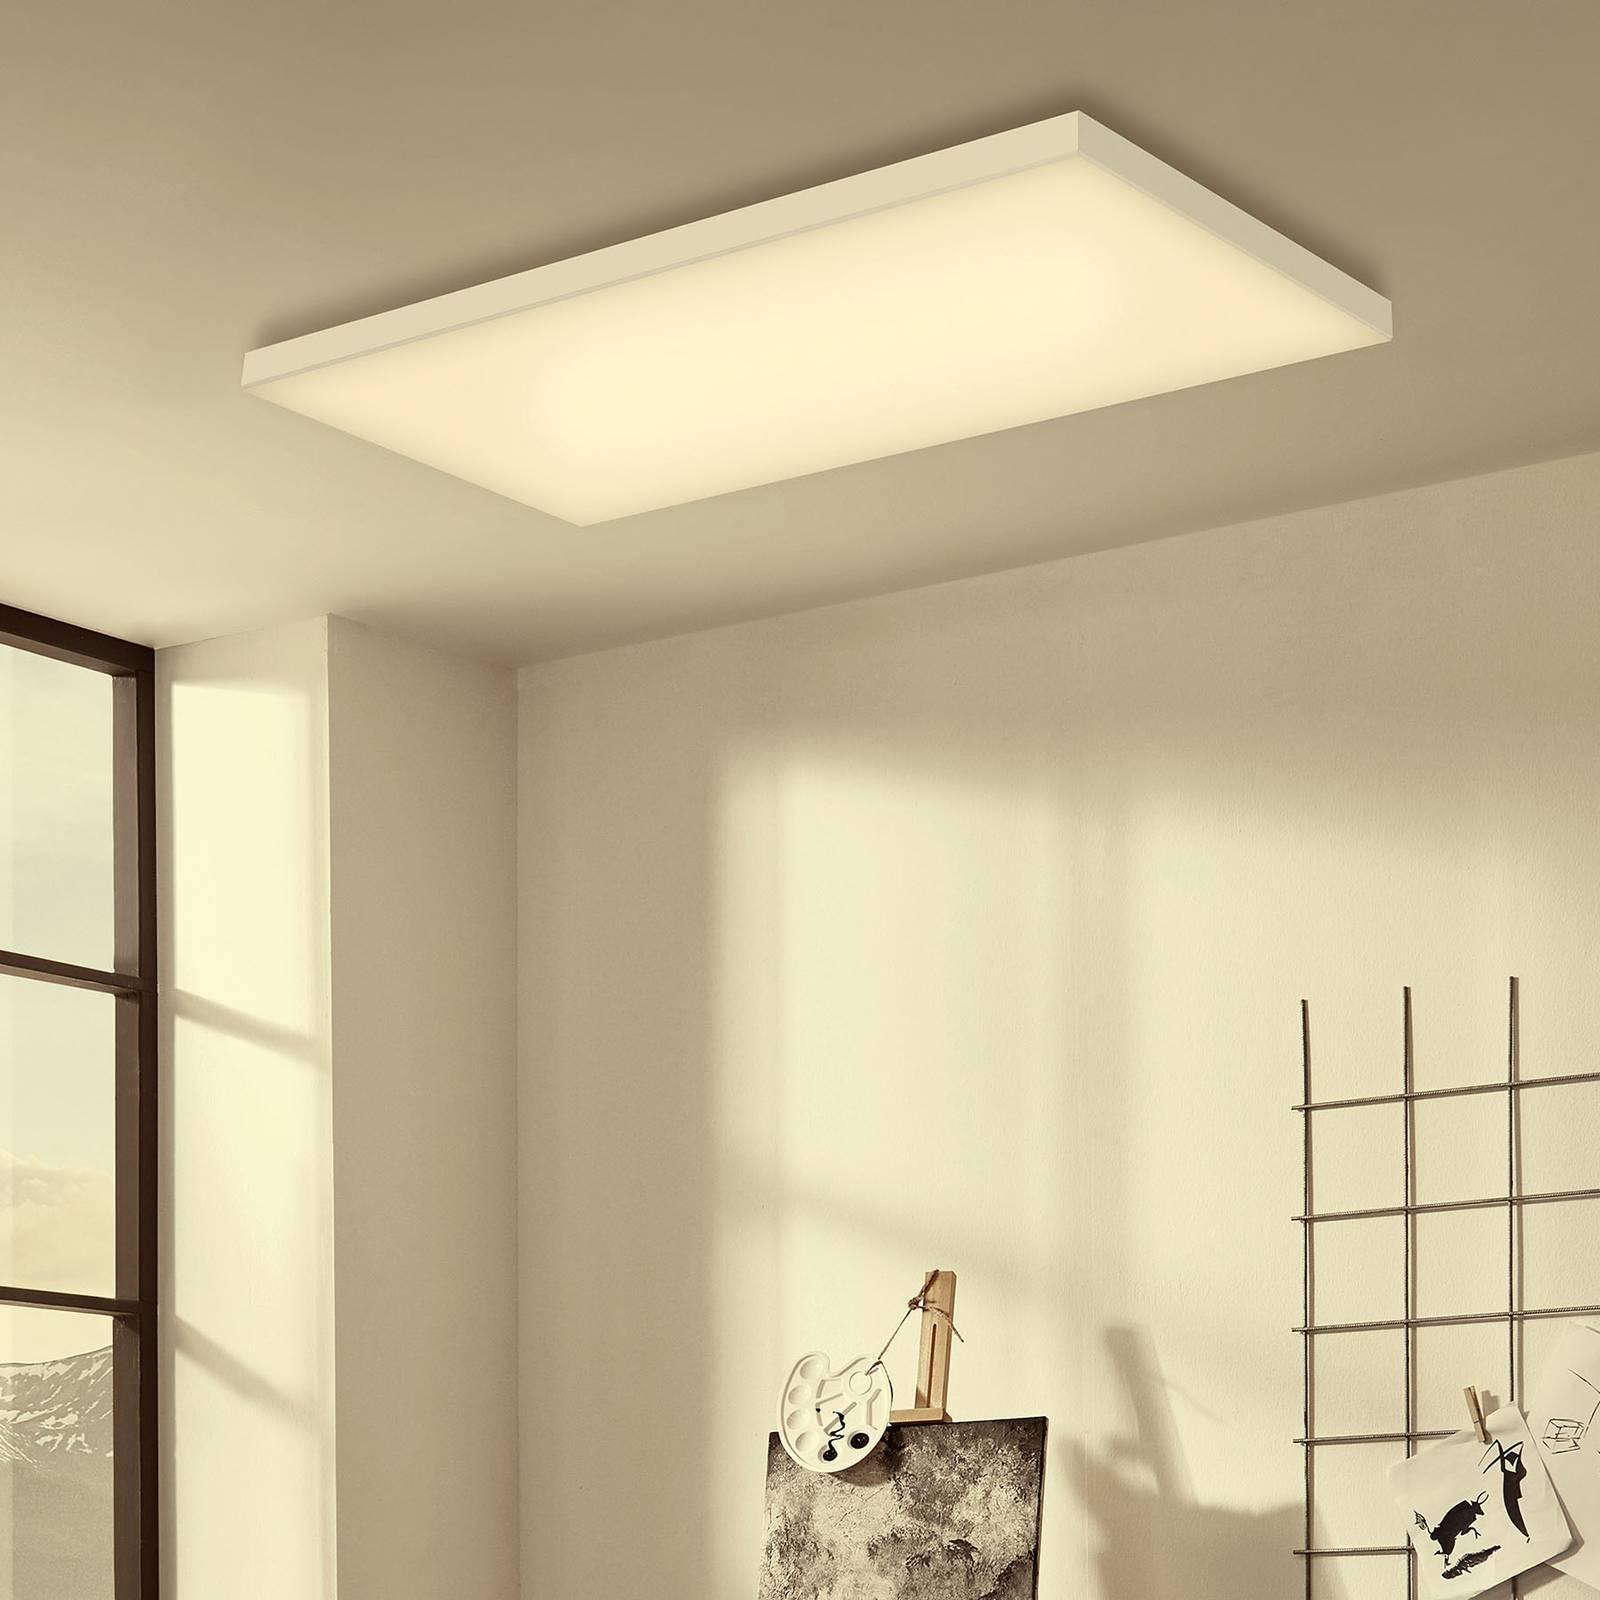 LED-kattovalaisin Frameless RGBW, 60x30cm